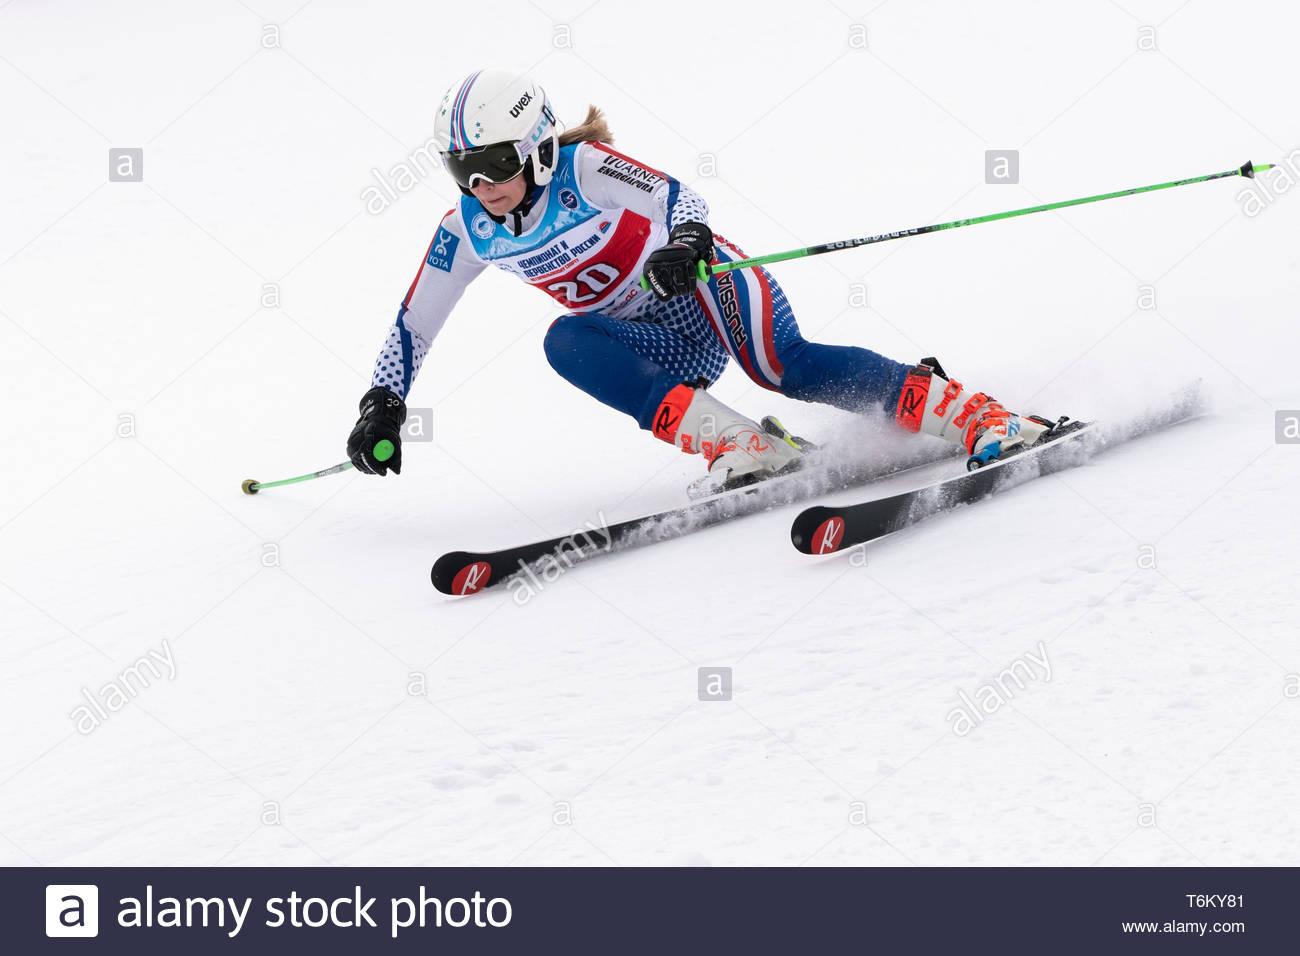 KAMCHATKA PENINSULA, RUSSIA - APR 2, 2019: Mountain skier Shubina Anastasia (Krasnoyarsk) skiing down mount. Russian Women's Alpine Skiing Cup, Intern - Stock Image